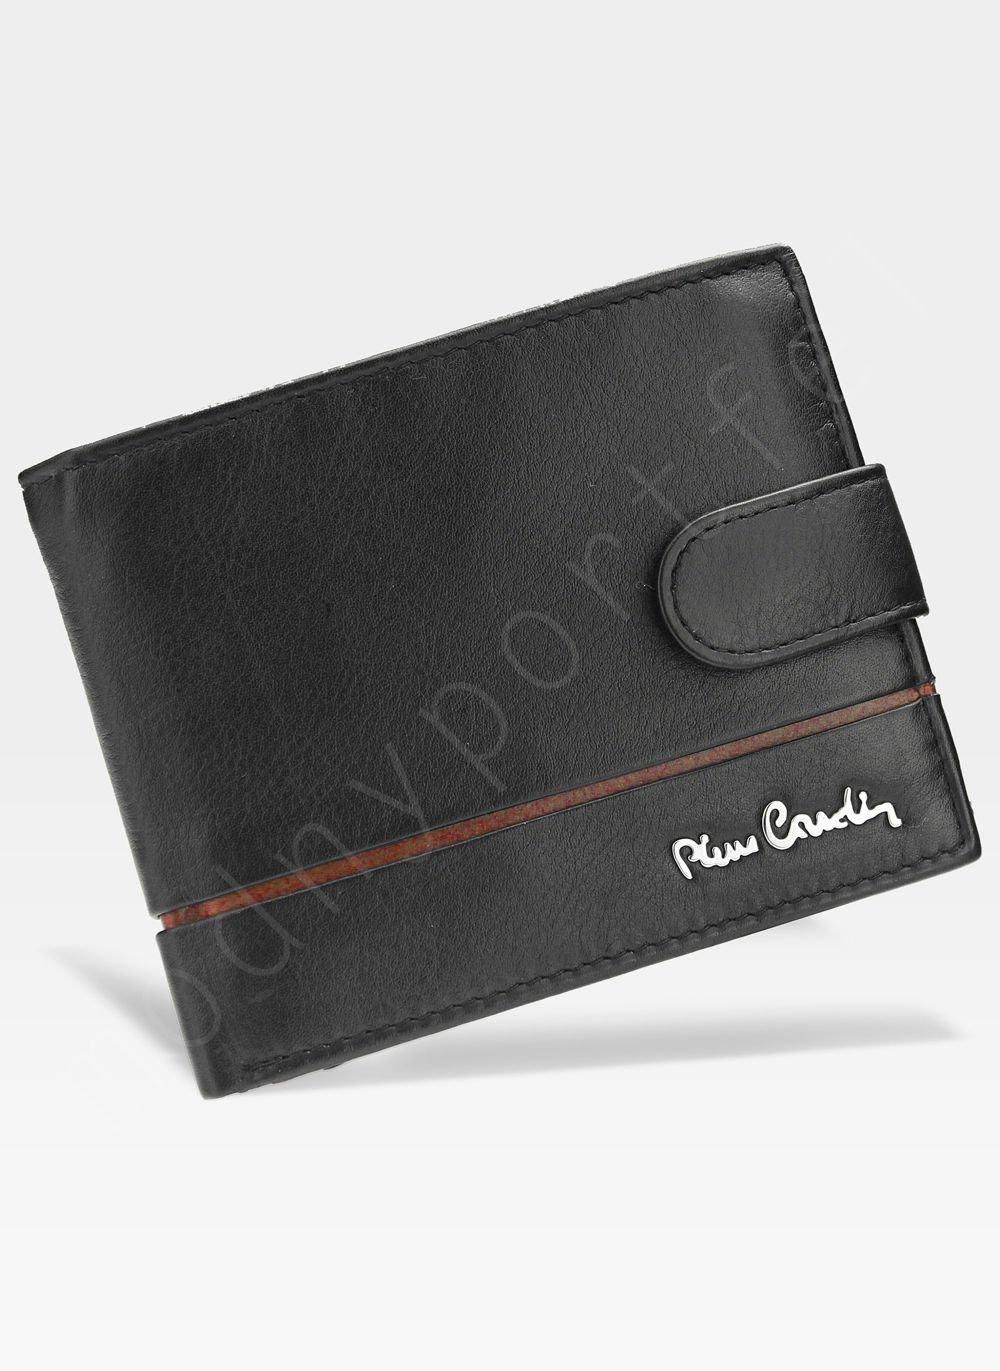 21e3a6382f2ee Dobry portfel męski Gentleman Pierre Cardin Tilak15 324A RFID ...